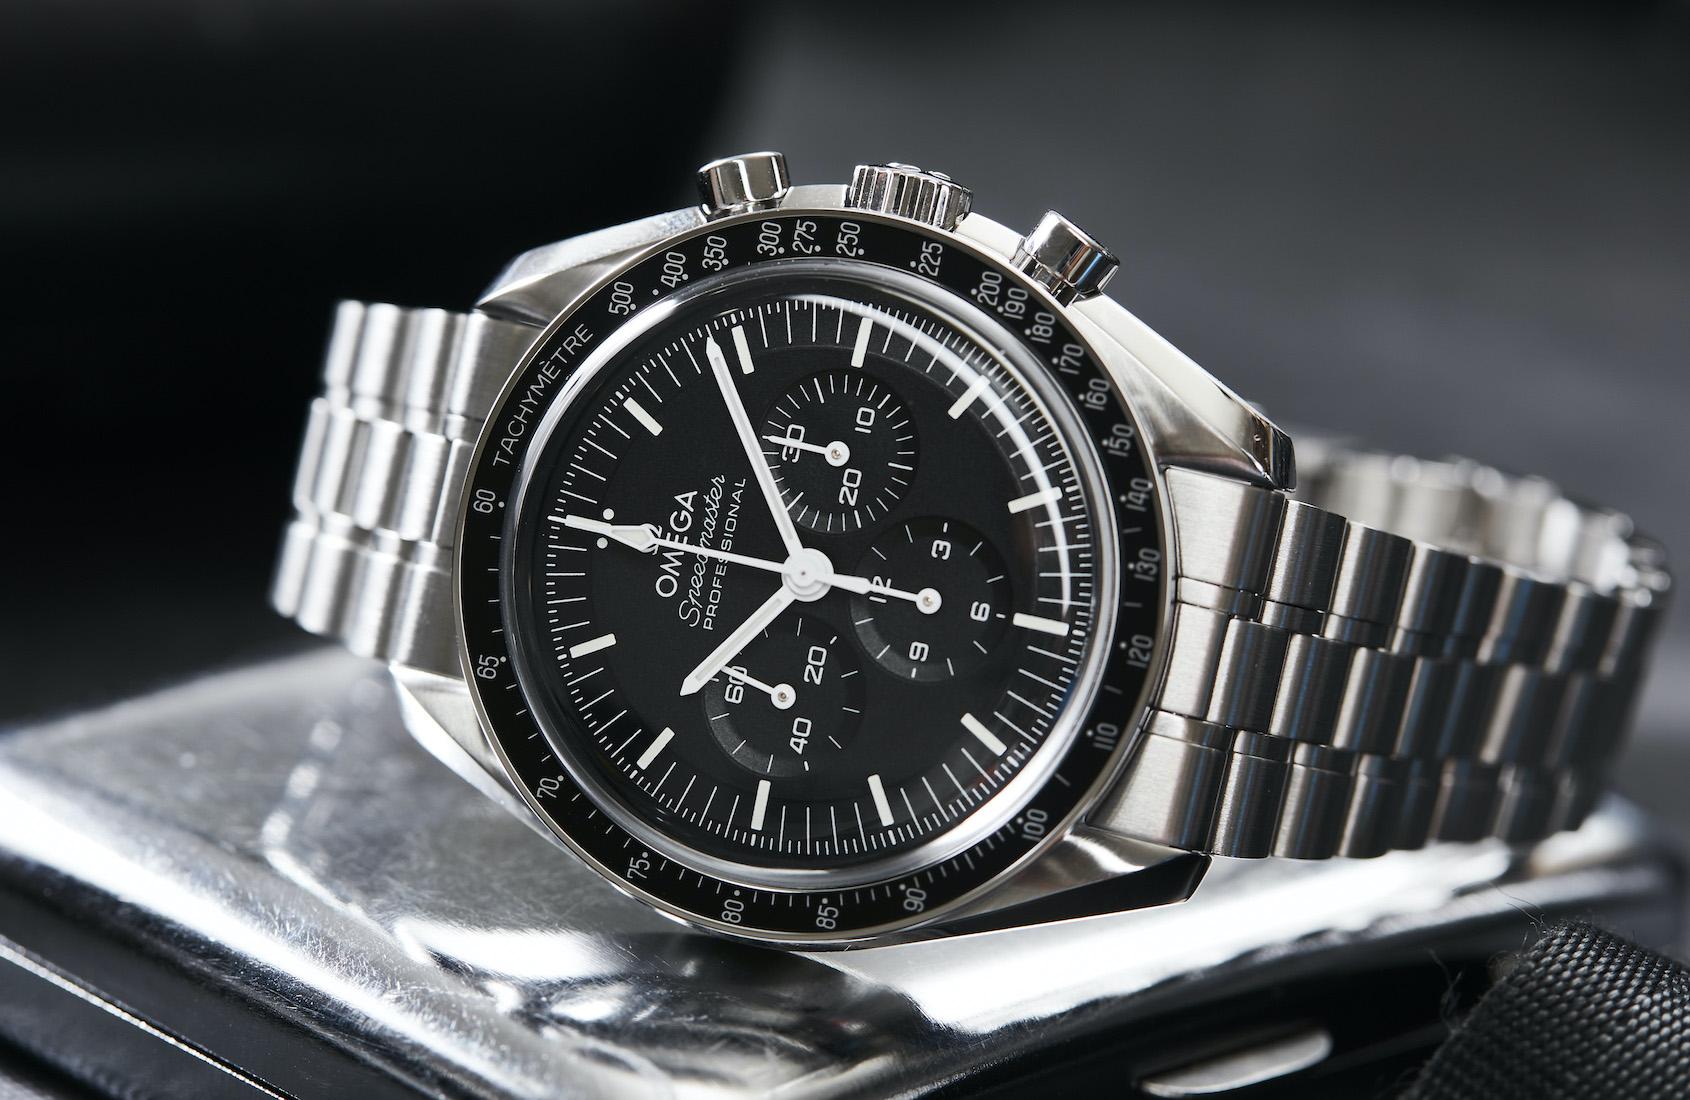 Omega Speedmaster Moonwatch Master Chronometer Collection